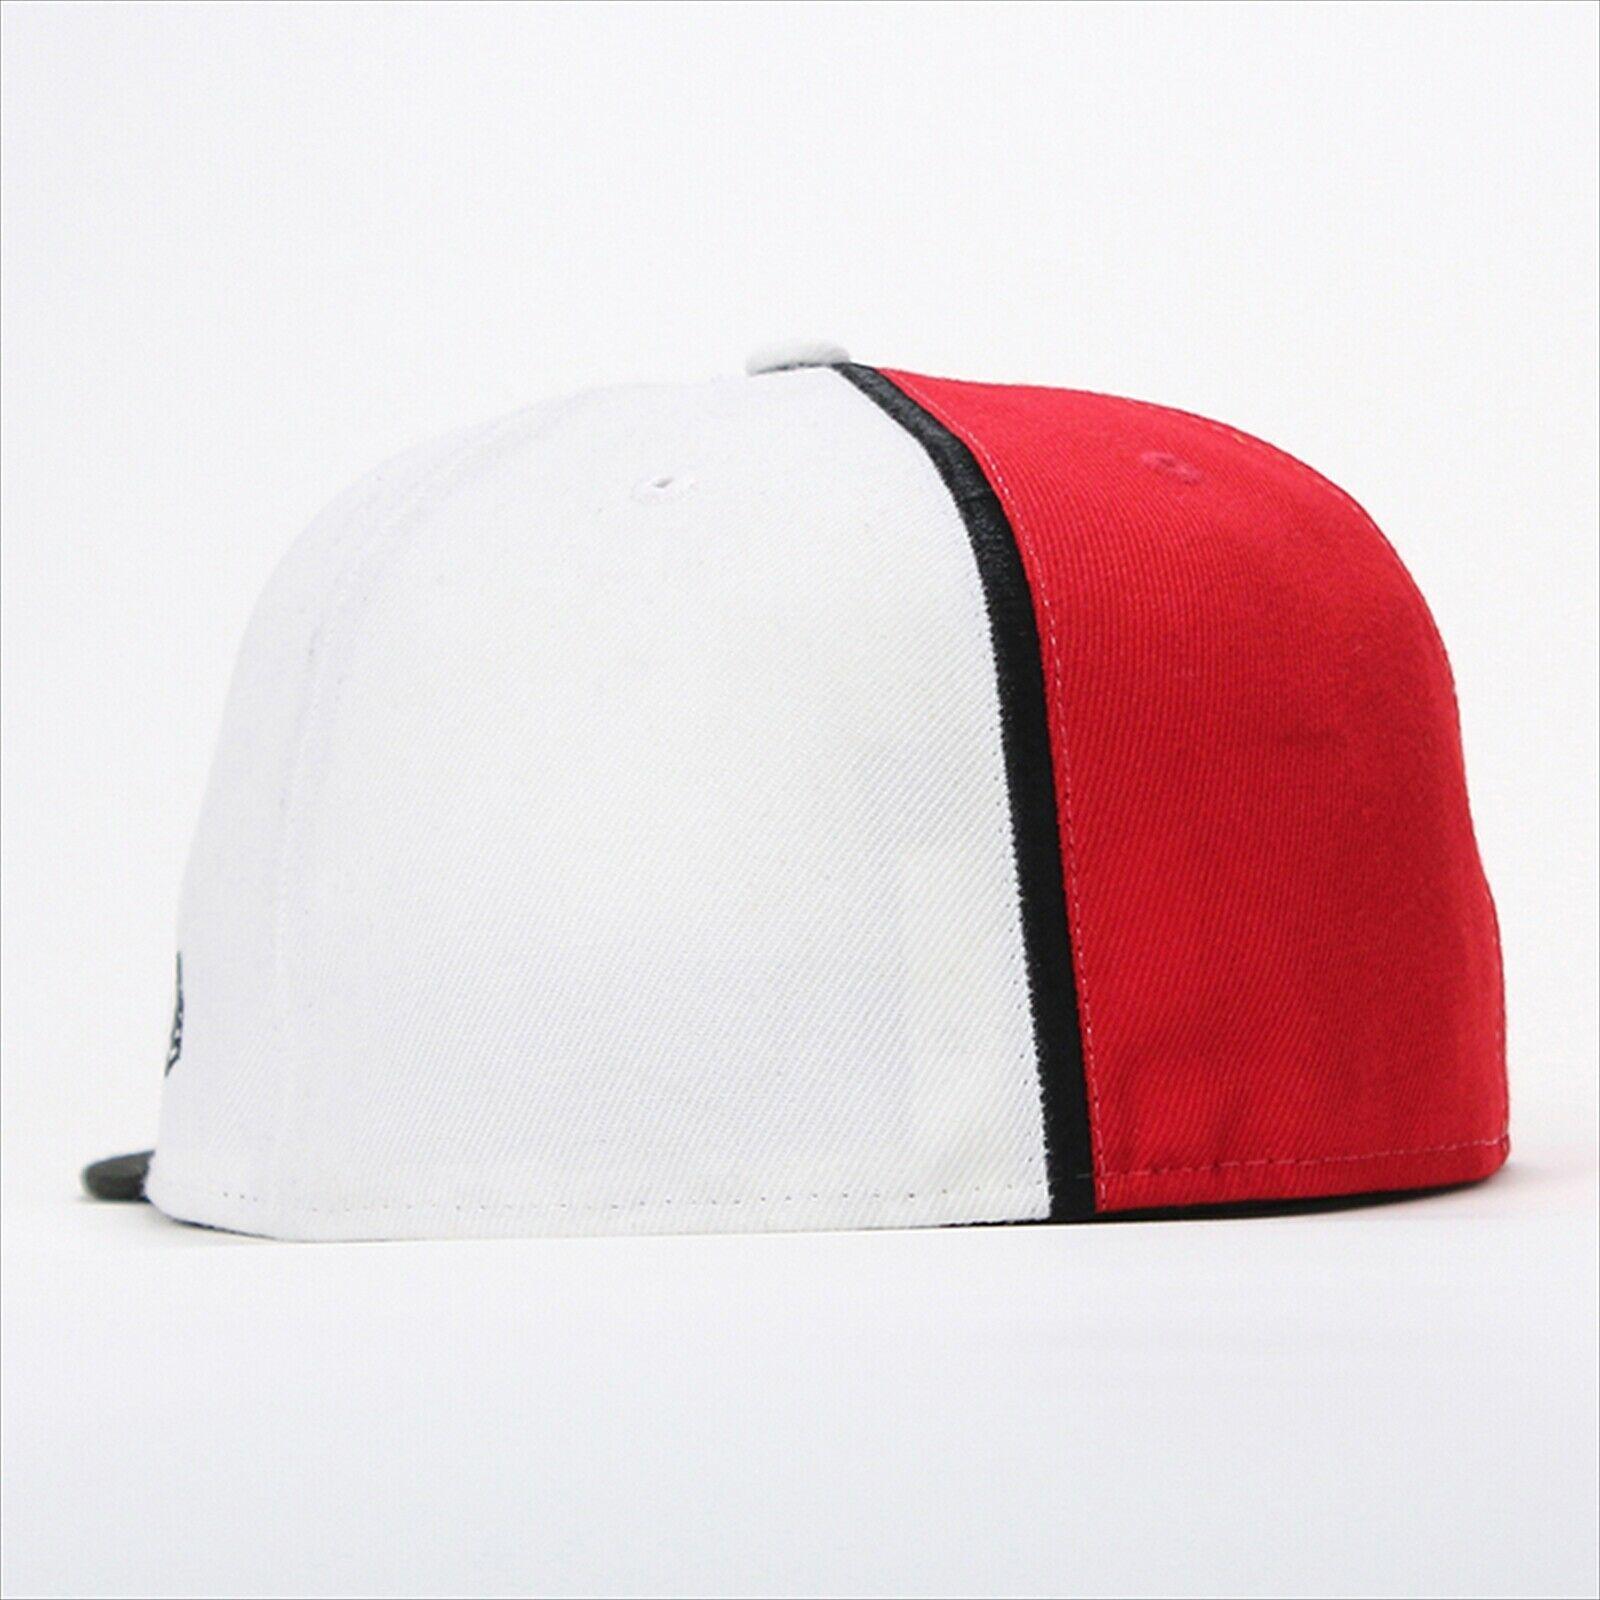 New Era Pokemon collaboration cap 59FITY BIG MOSTER BALL White / Scarlet